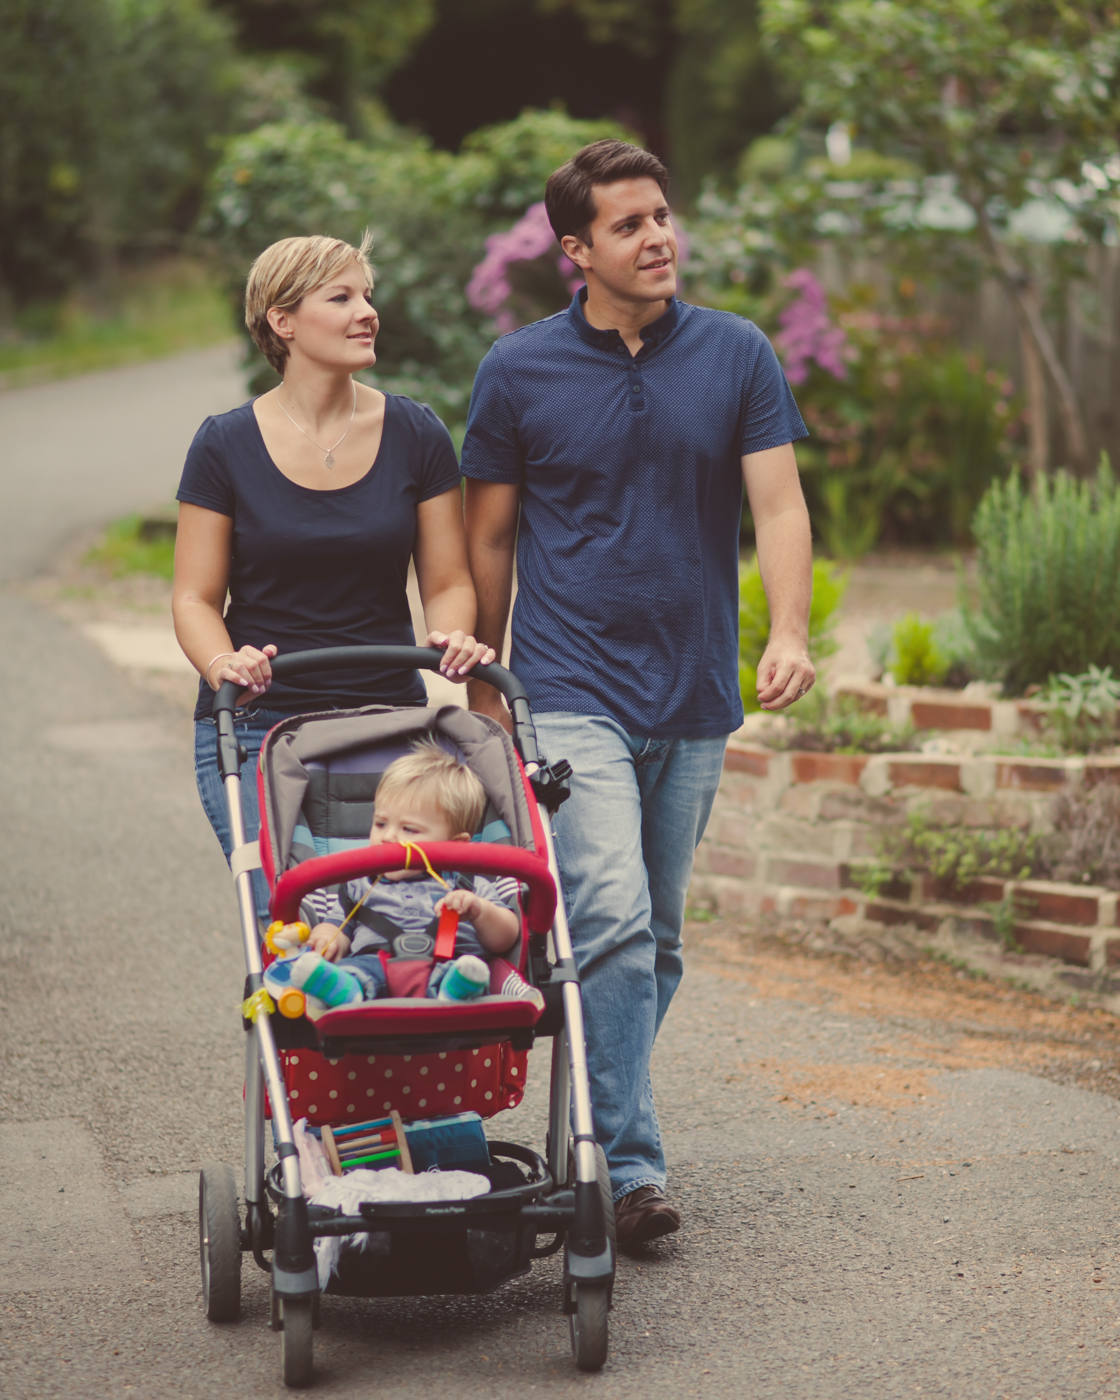 014 - Kelly, Matthew and Hugo Fine Art Family Photography by www.mpmedia.co.uk -82.JPG